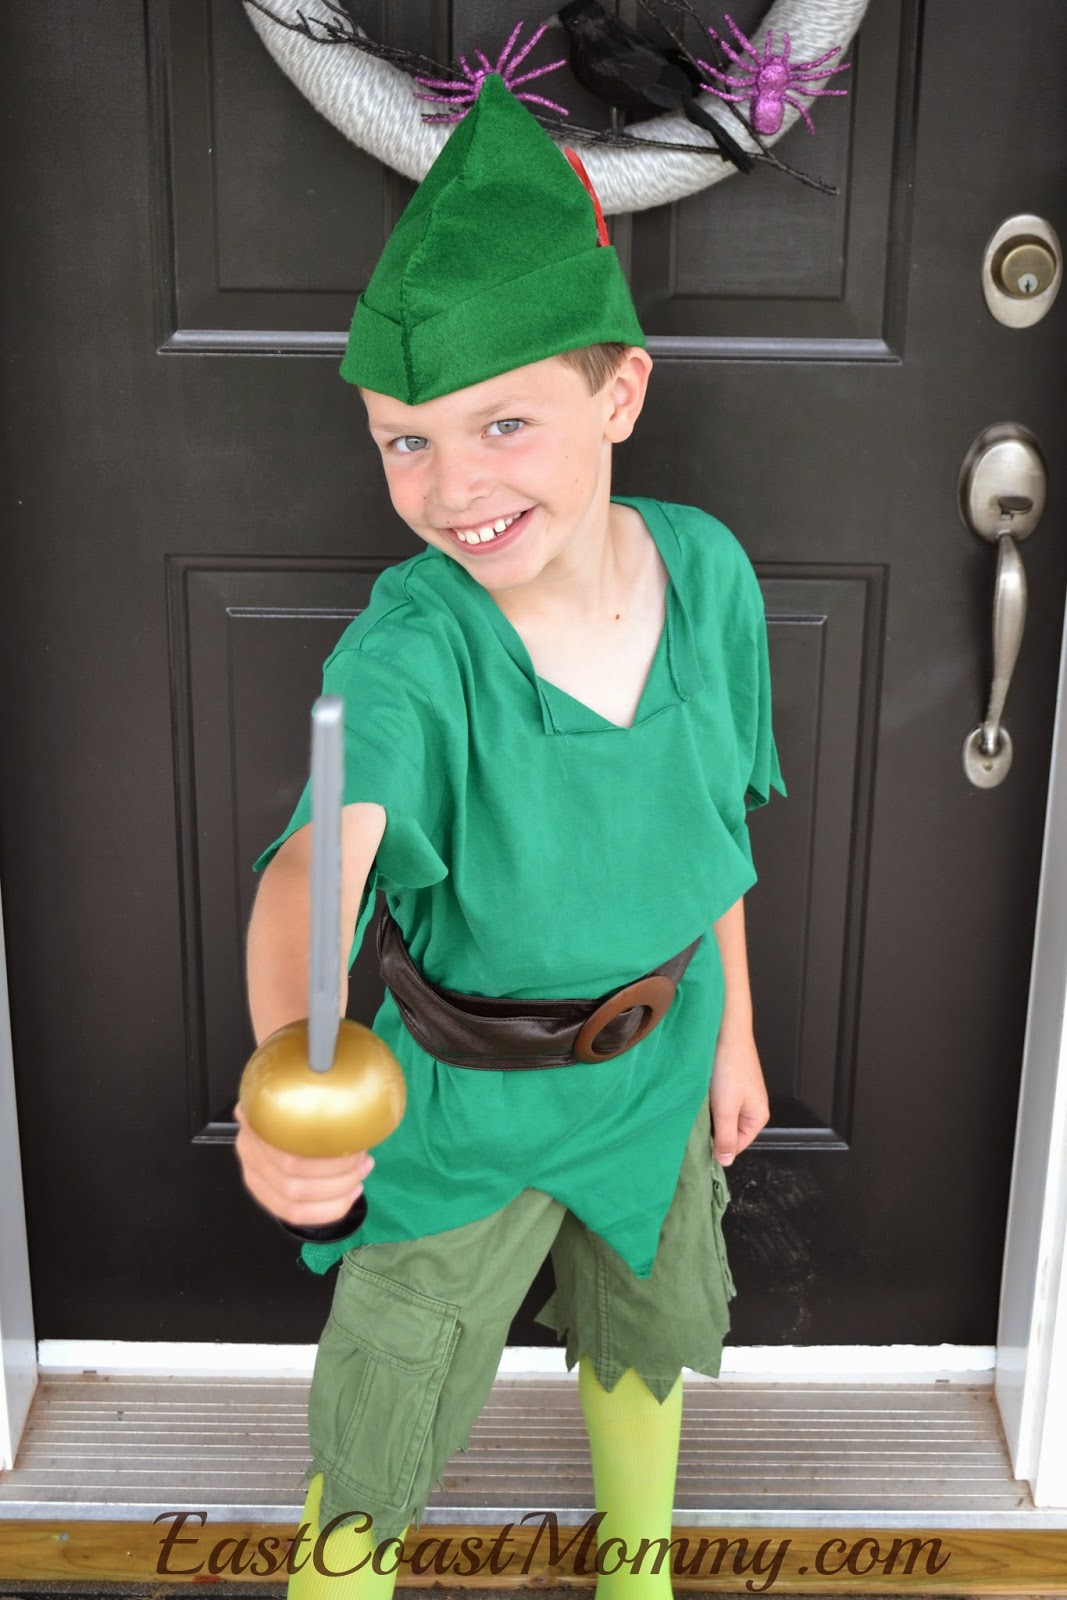 sc 1 st  East Coast Mommy & East Coast Mommy: DIY Peter Pan Costume